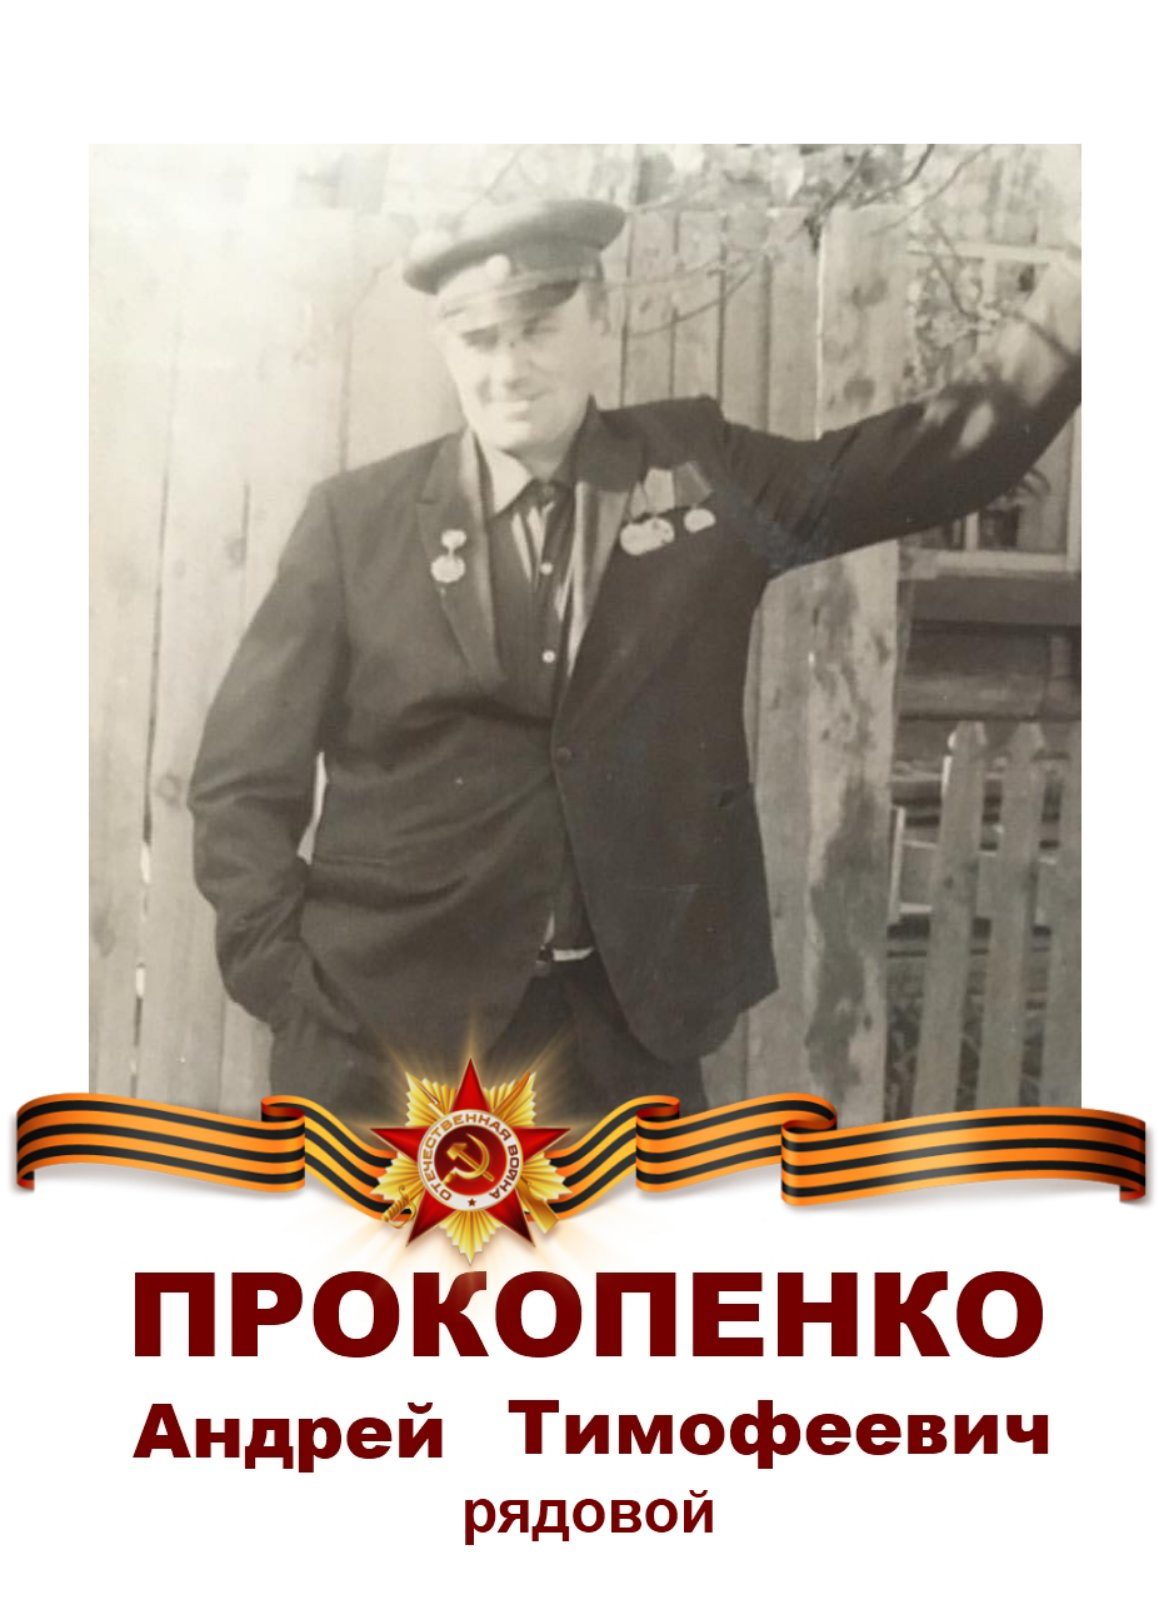 Прокопенко Андрей Тимофеевич 1920-2002